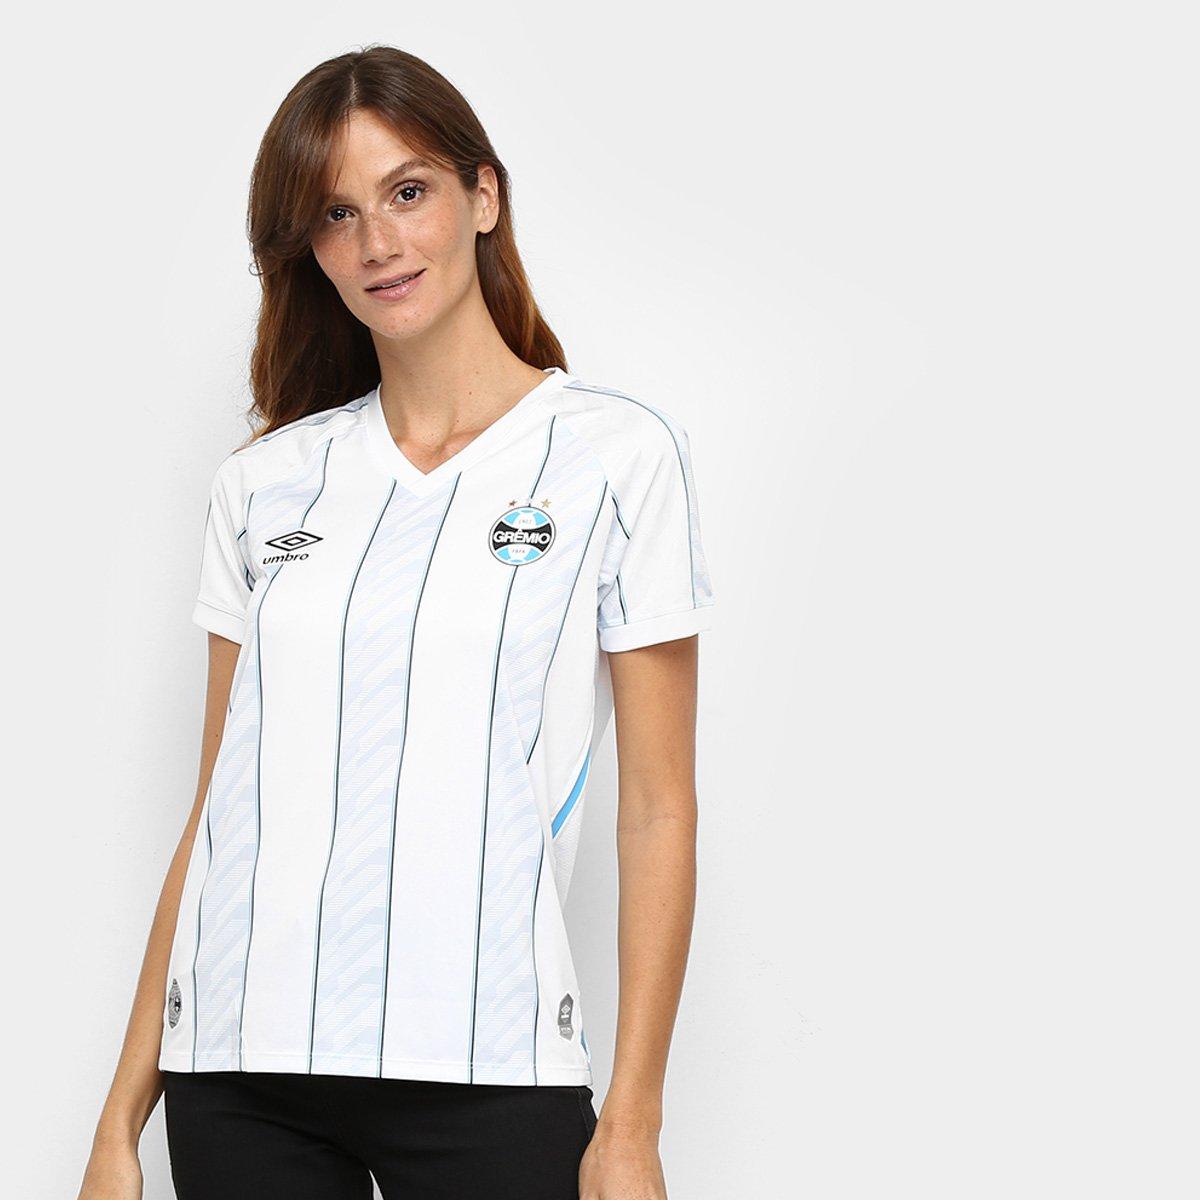 Camisa Grêmio II 20/21 s/n° Estádio Umbro Feminina